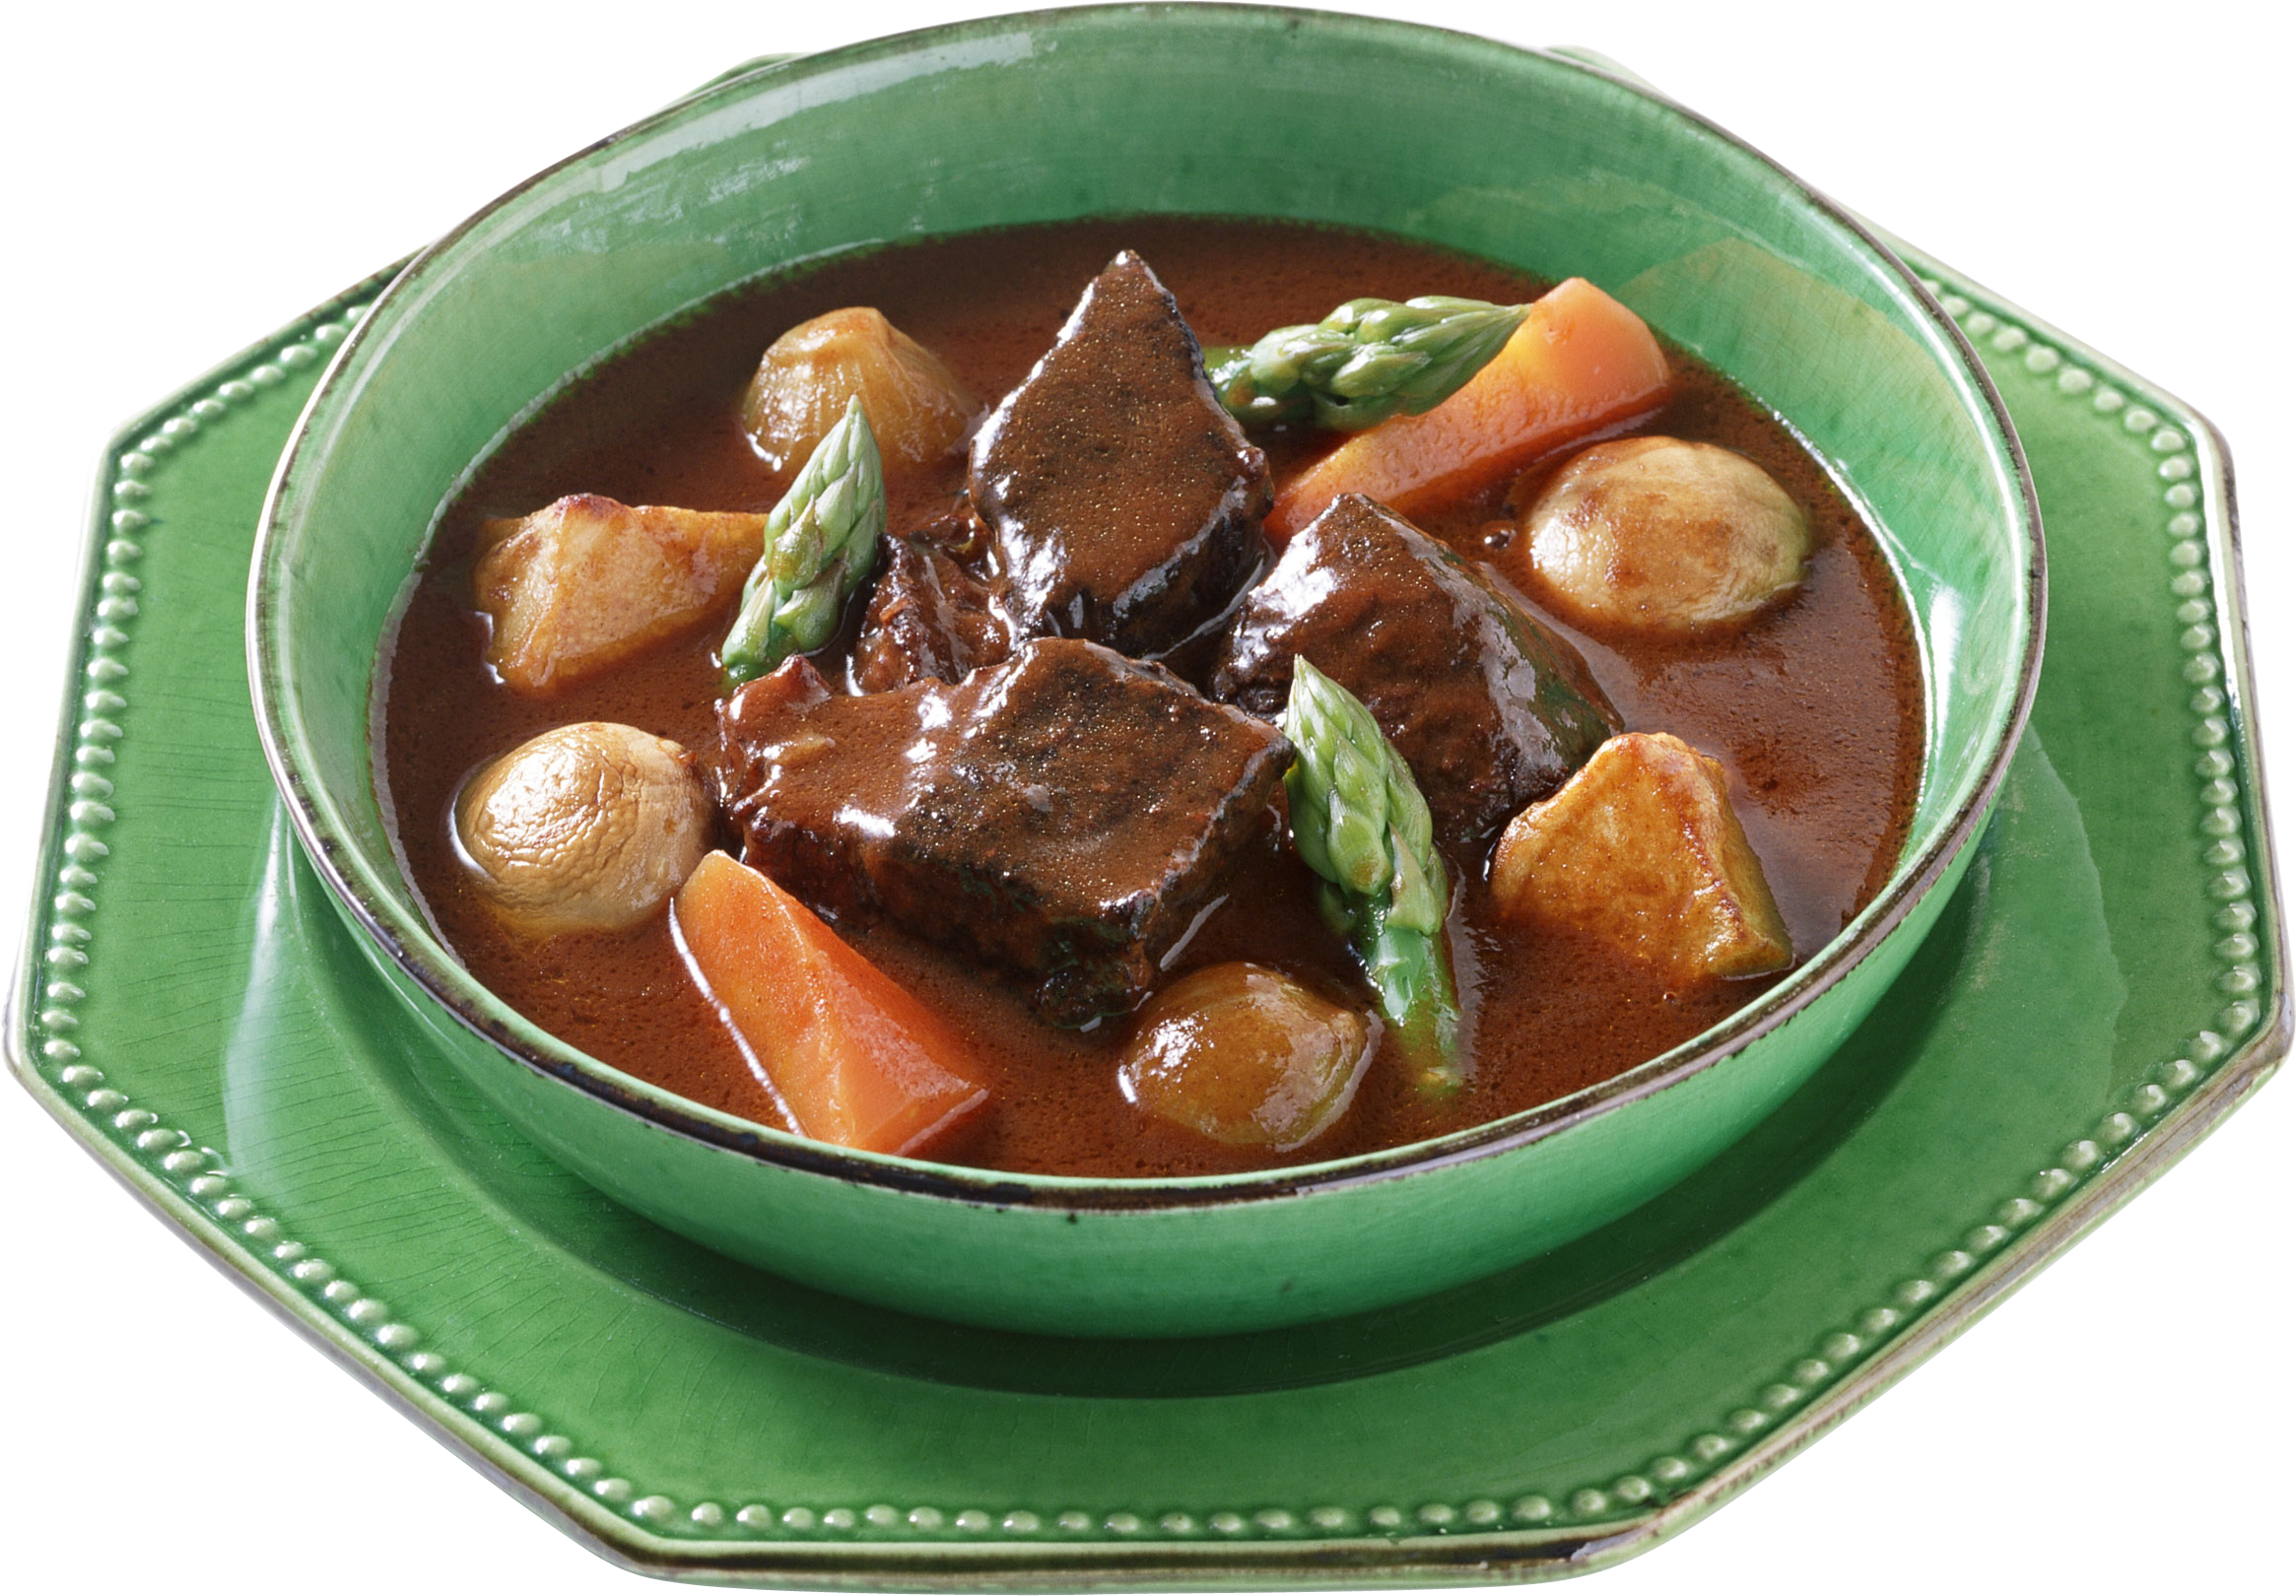 Png image purepng free. Soup clipart goulash